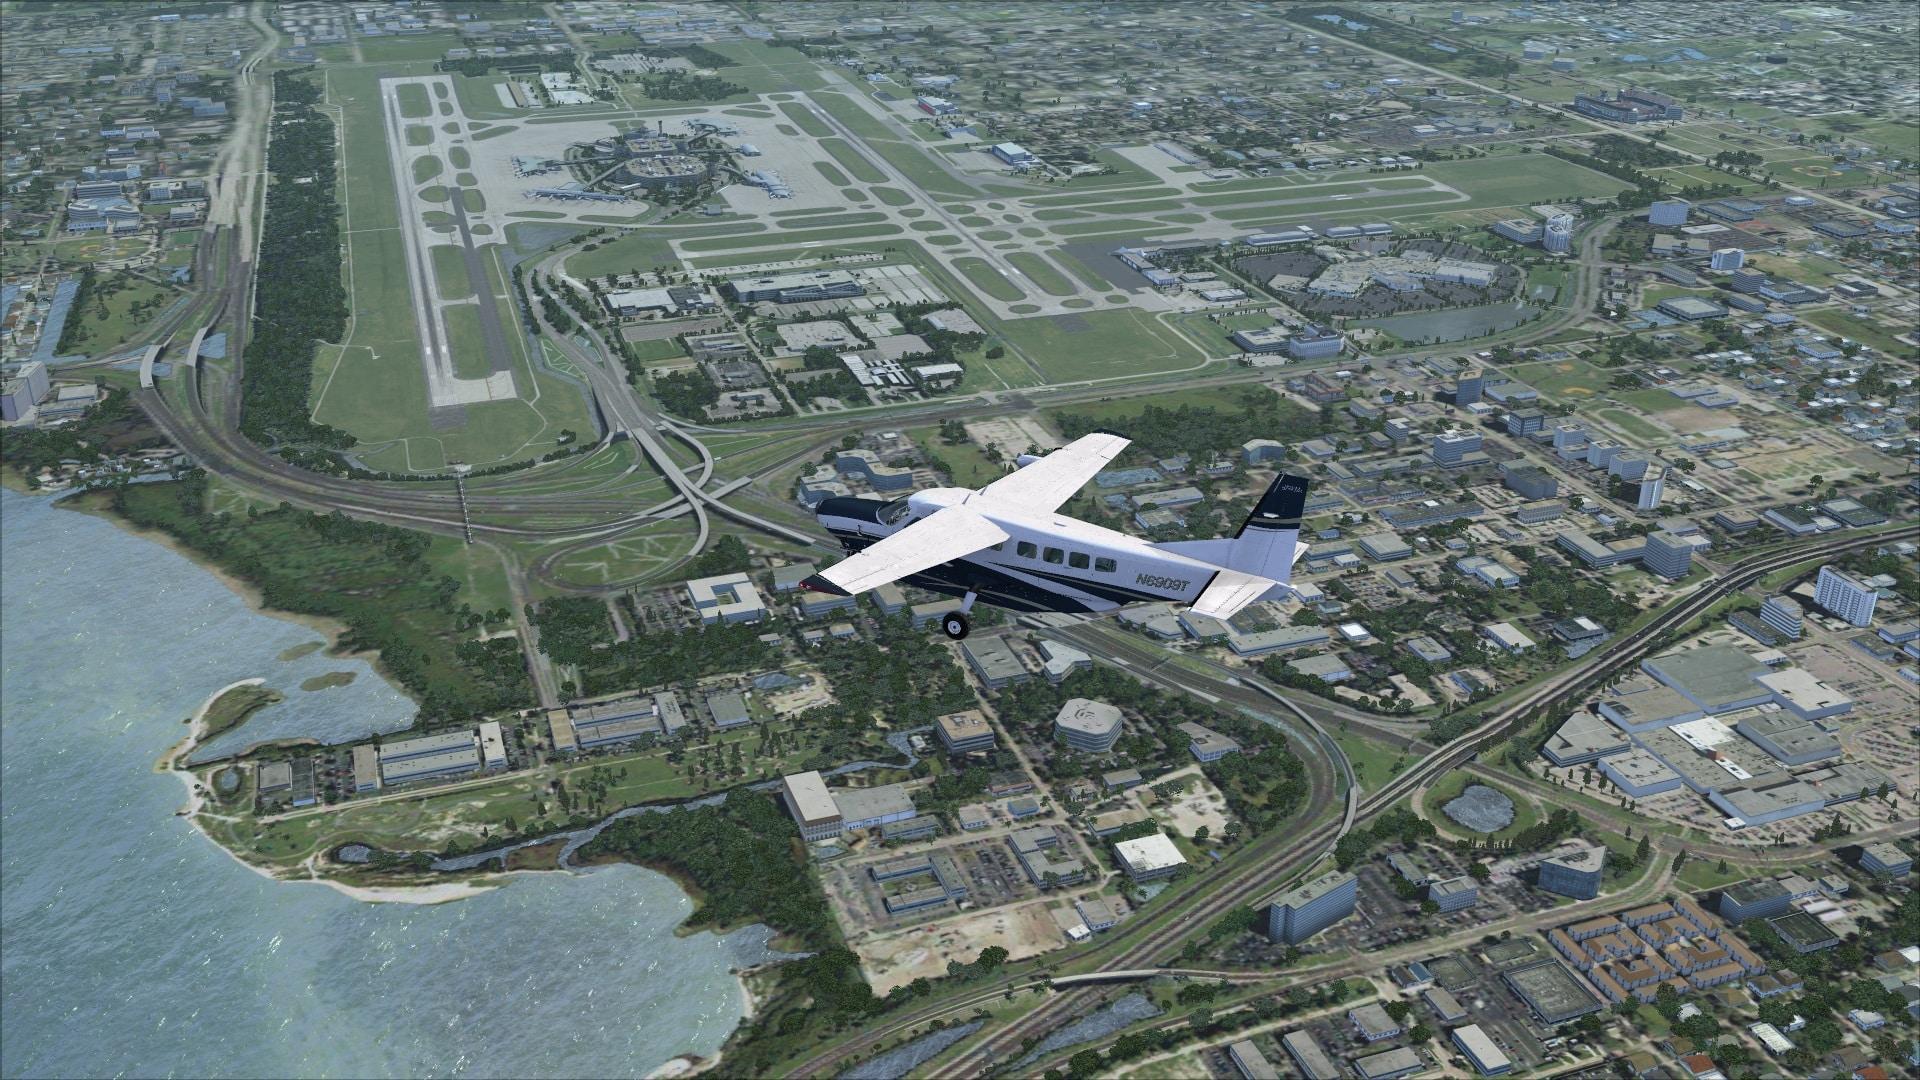 Fsx Dubai Airport Scenery Free   scenerywallpaper website